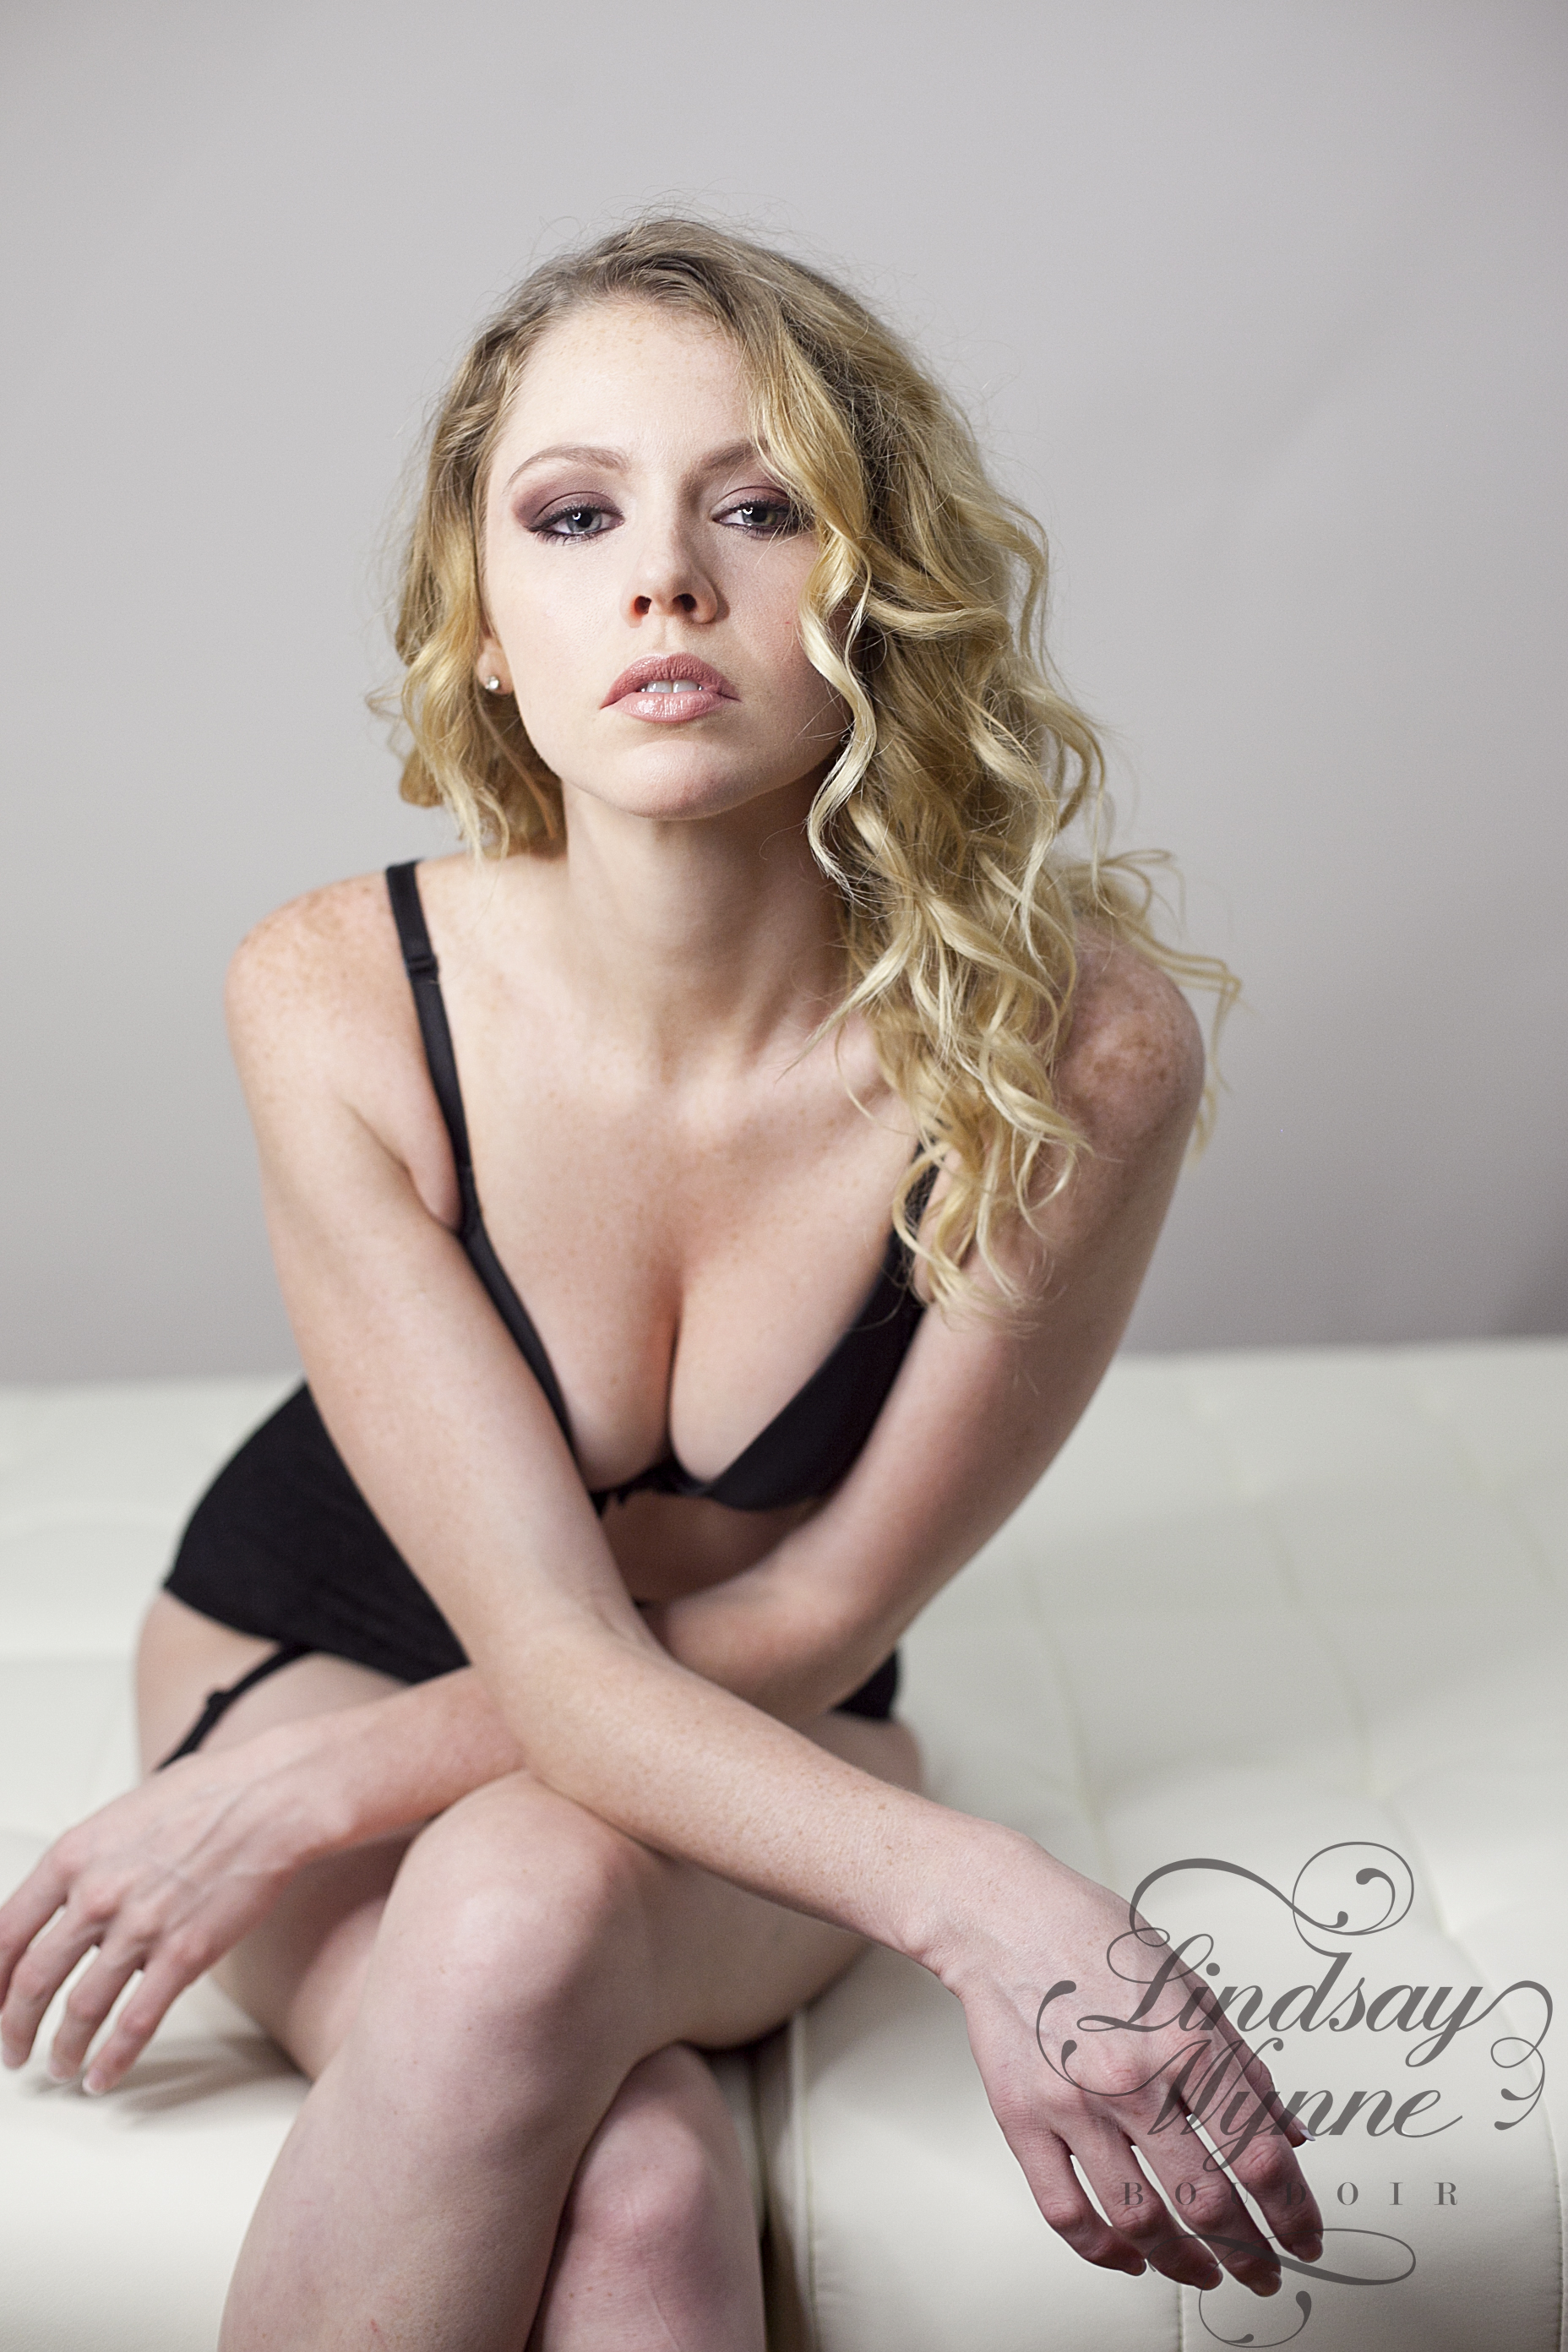 Lindsay Wynne Boudoir-Luxuy Boudoir Charlotte NC-Miss K 023.jpg